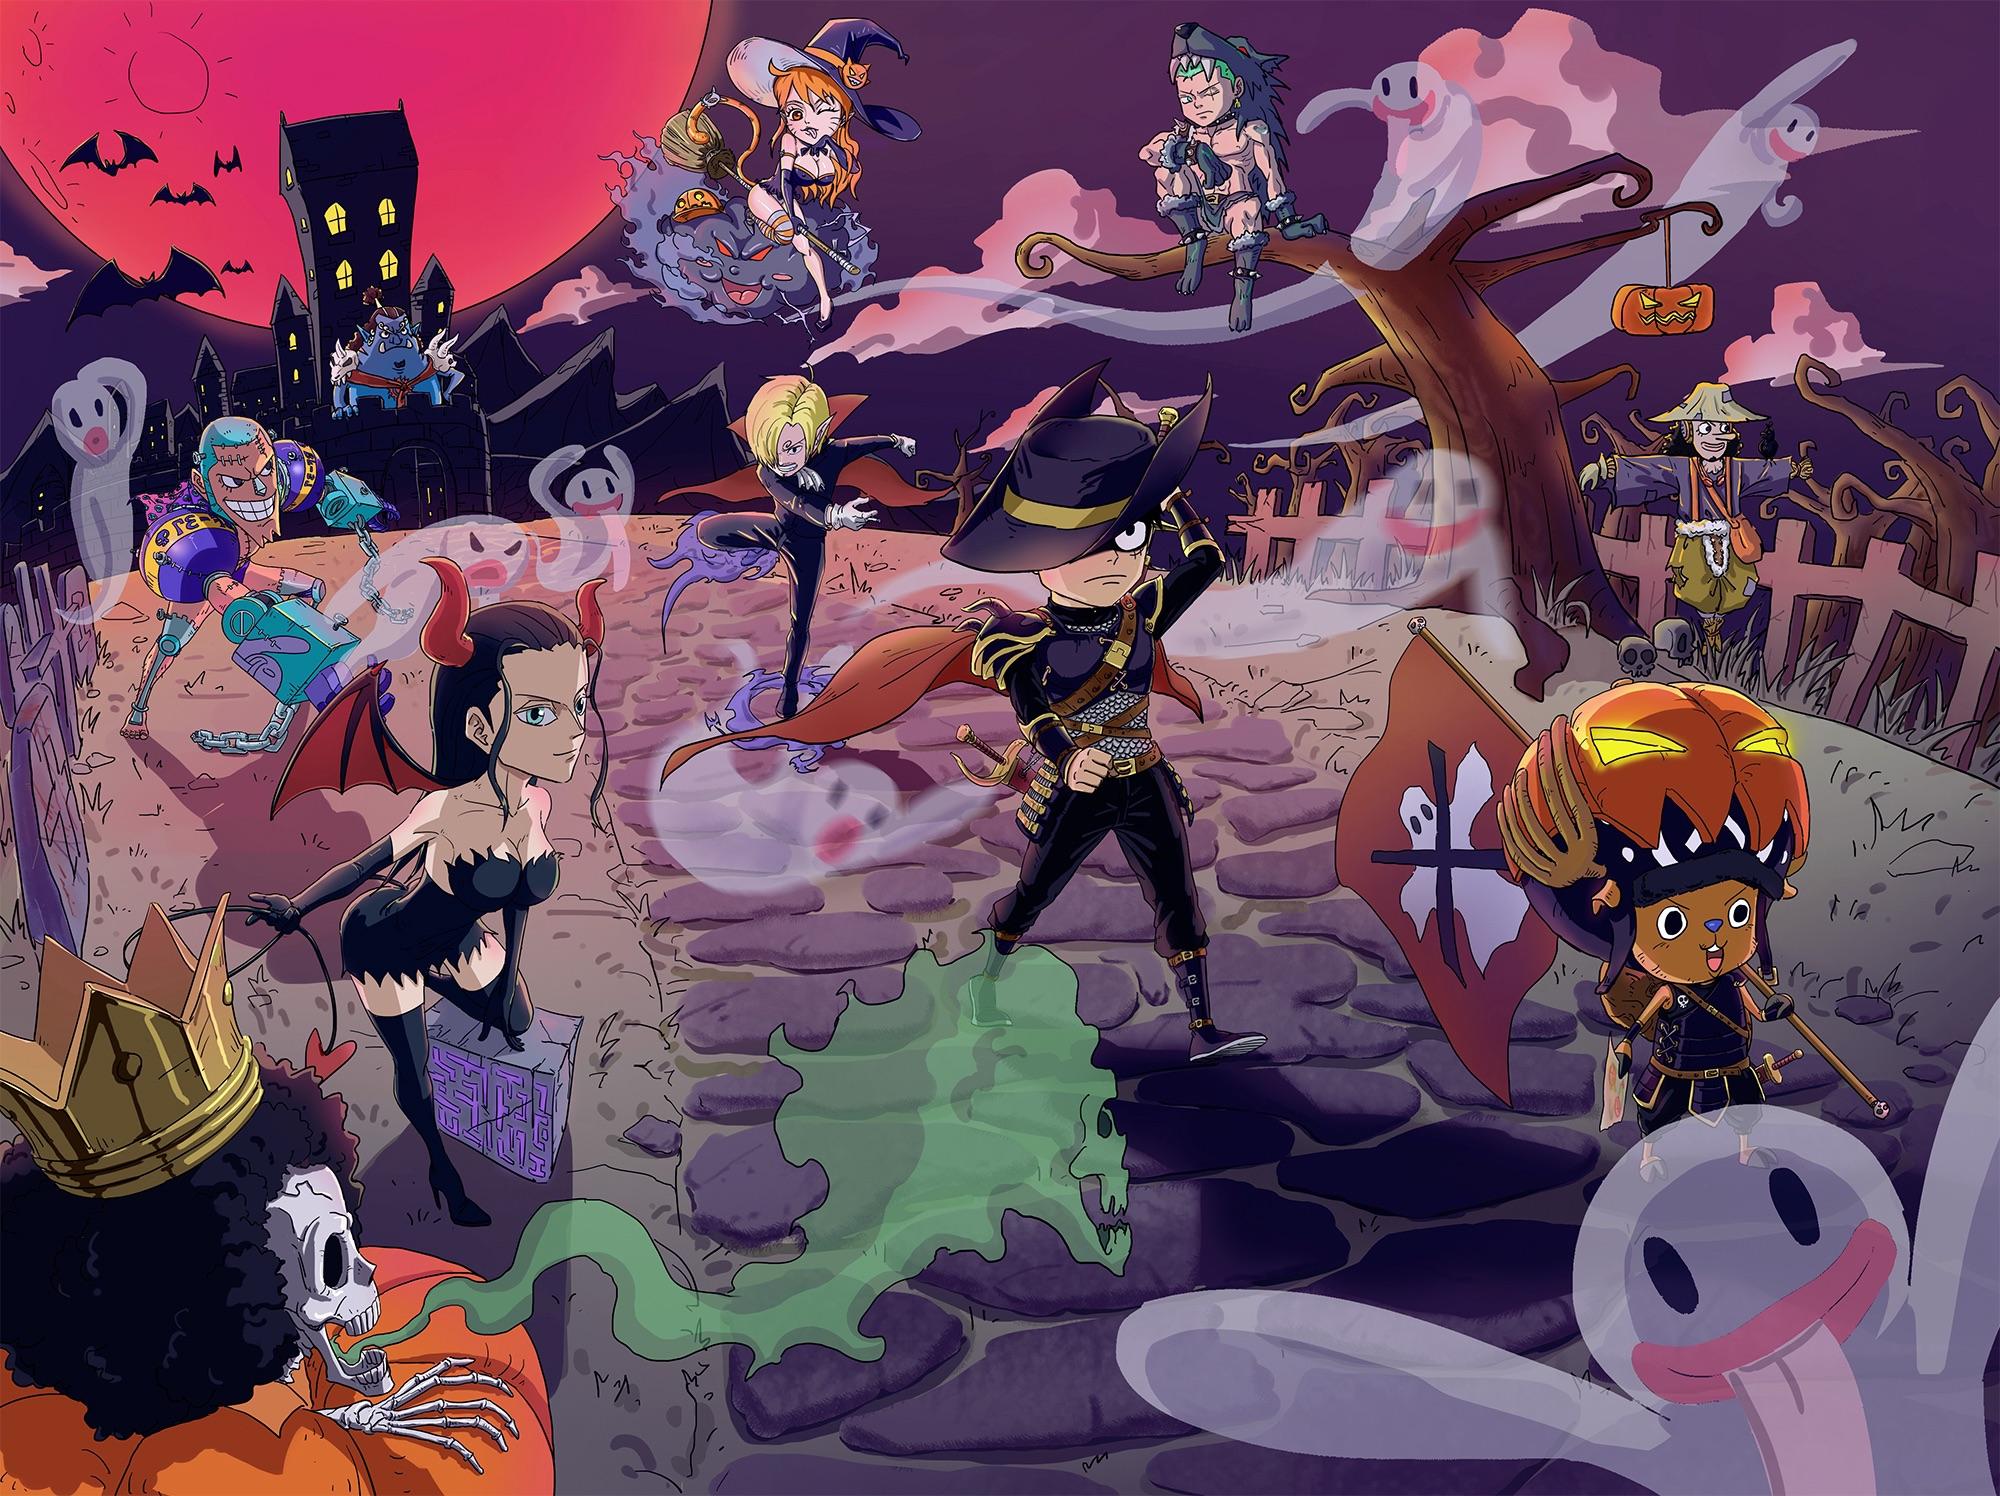 Luffy Van Helsing (มัดจำ) [[SOLD OUT]]